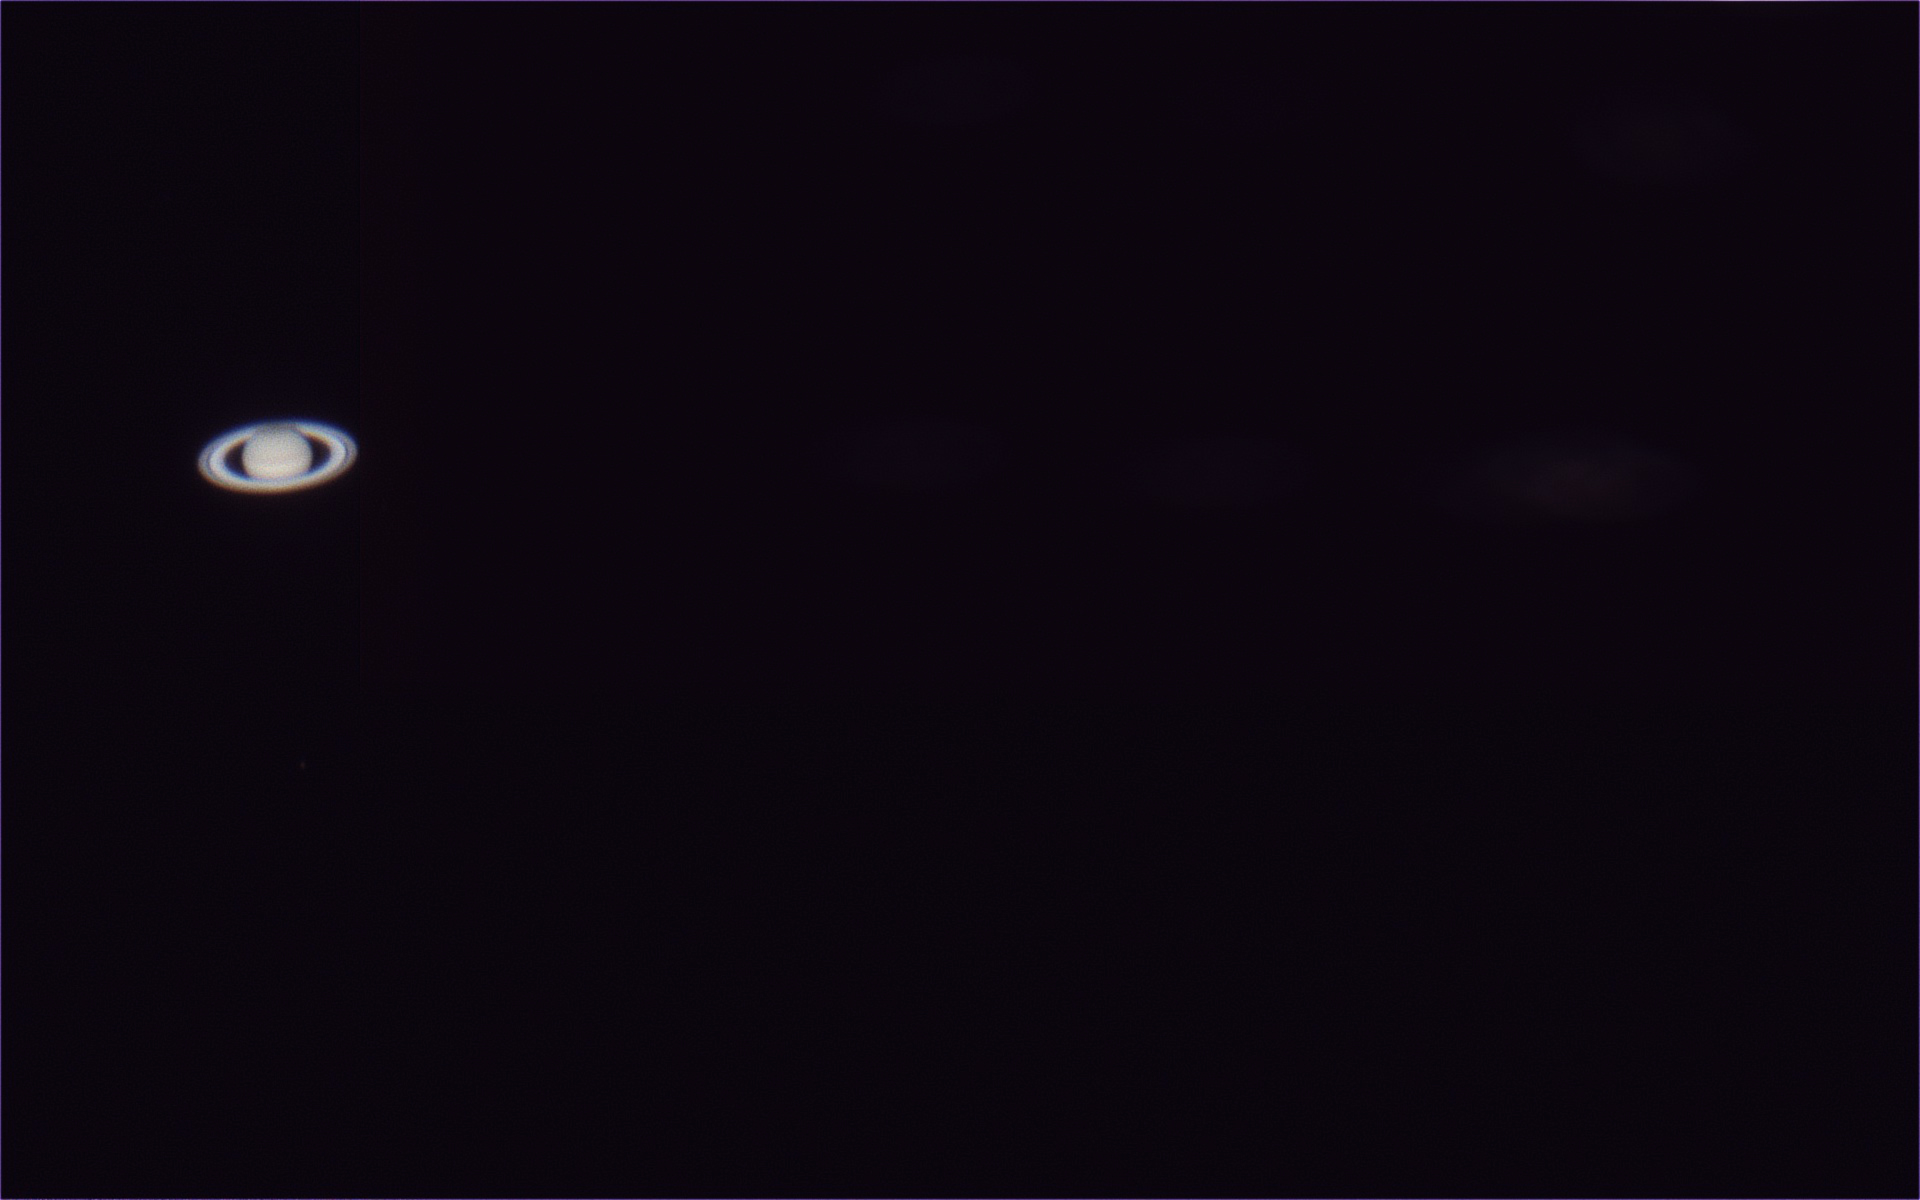 Saturn_2018Jun03_02_05_48_1920px.jpg